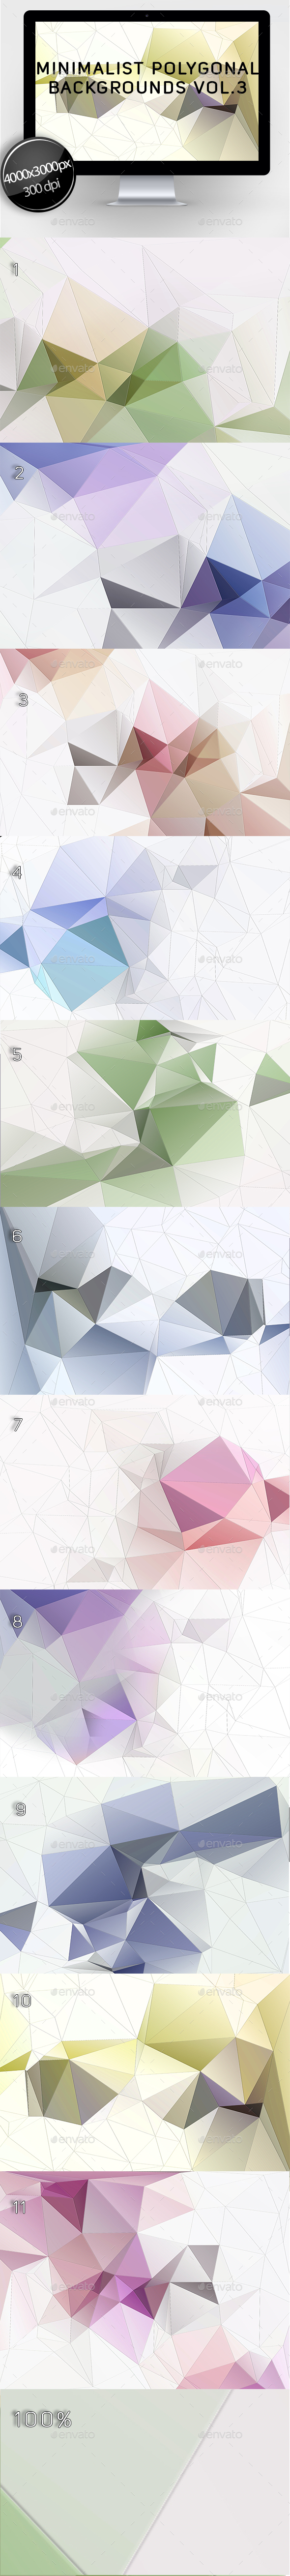 Minimalist Polygonal Backgrounds Vol.3